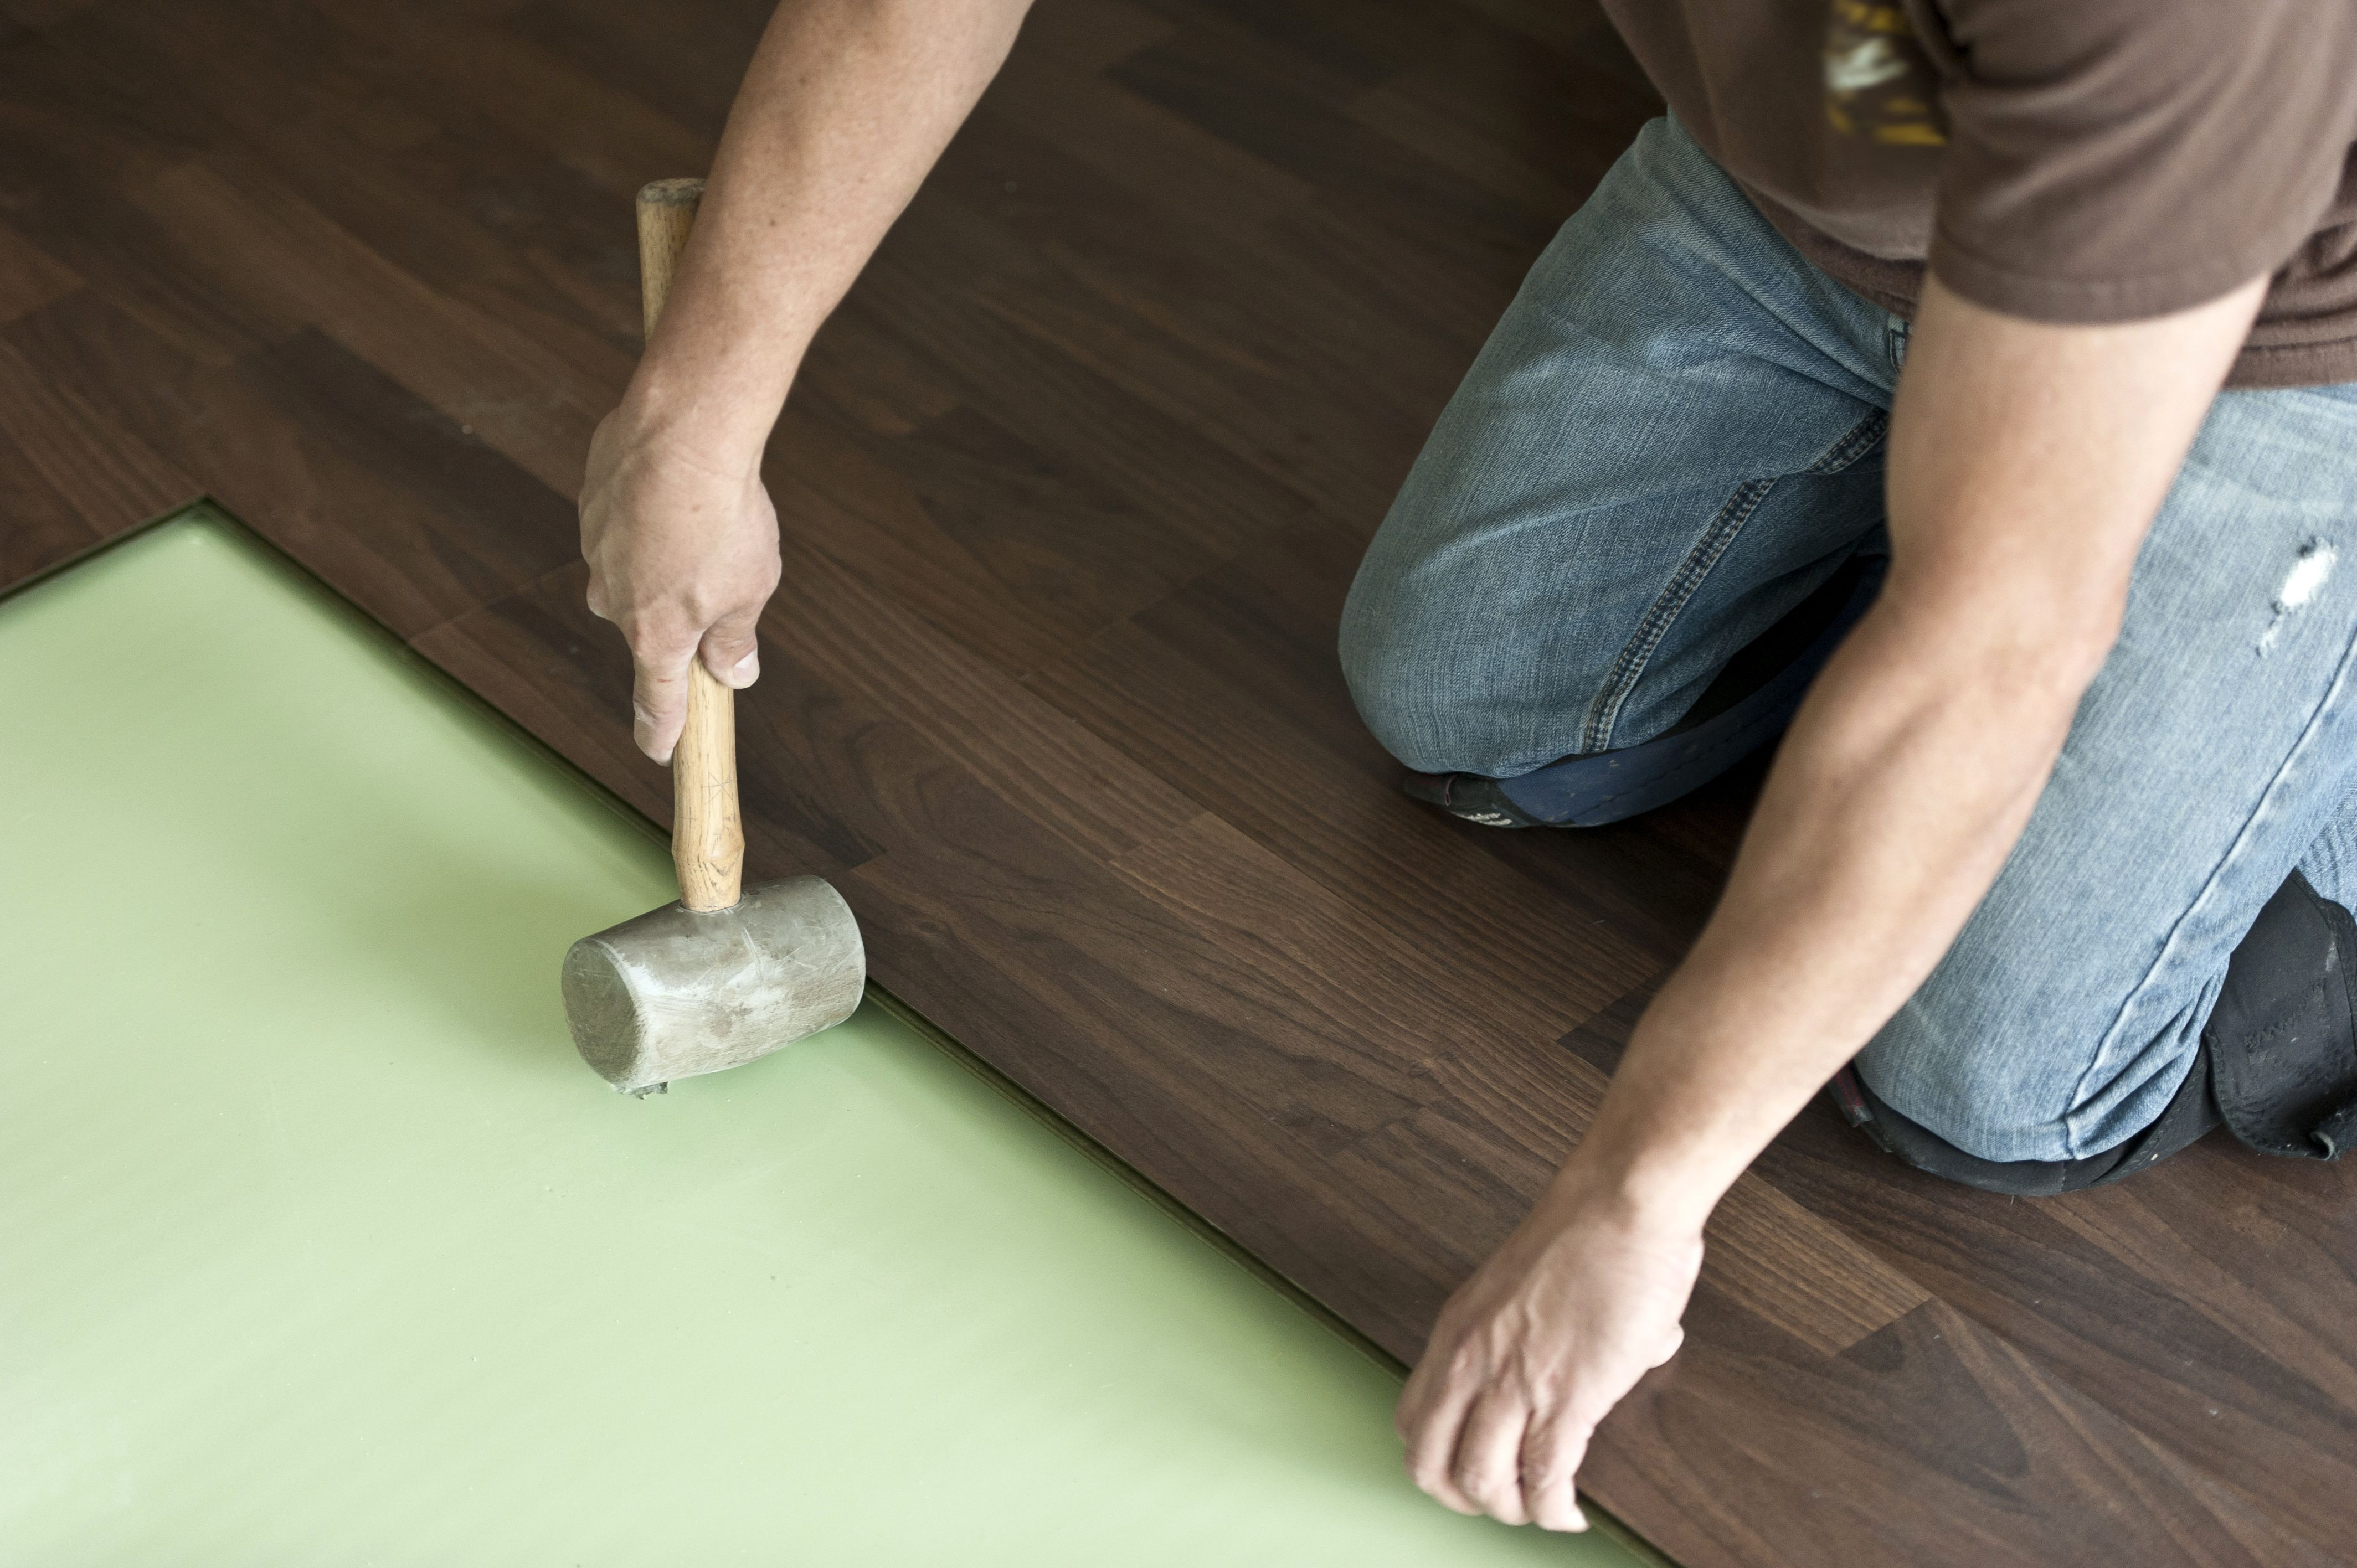 engineered hardwood vs solid wood flooring of can a foam pad be use under solid hardwood flooring inside installing hardwood floor 155149312 57e967d45f9b586c35ade84a